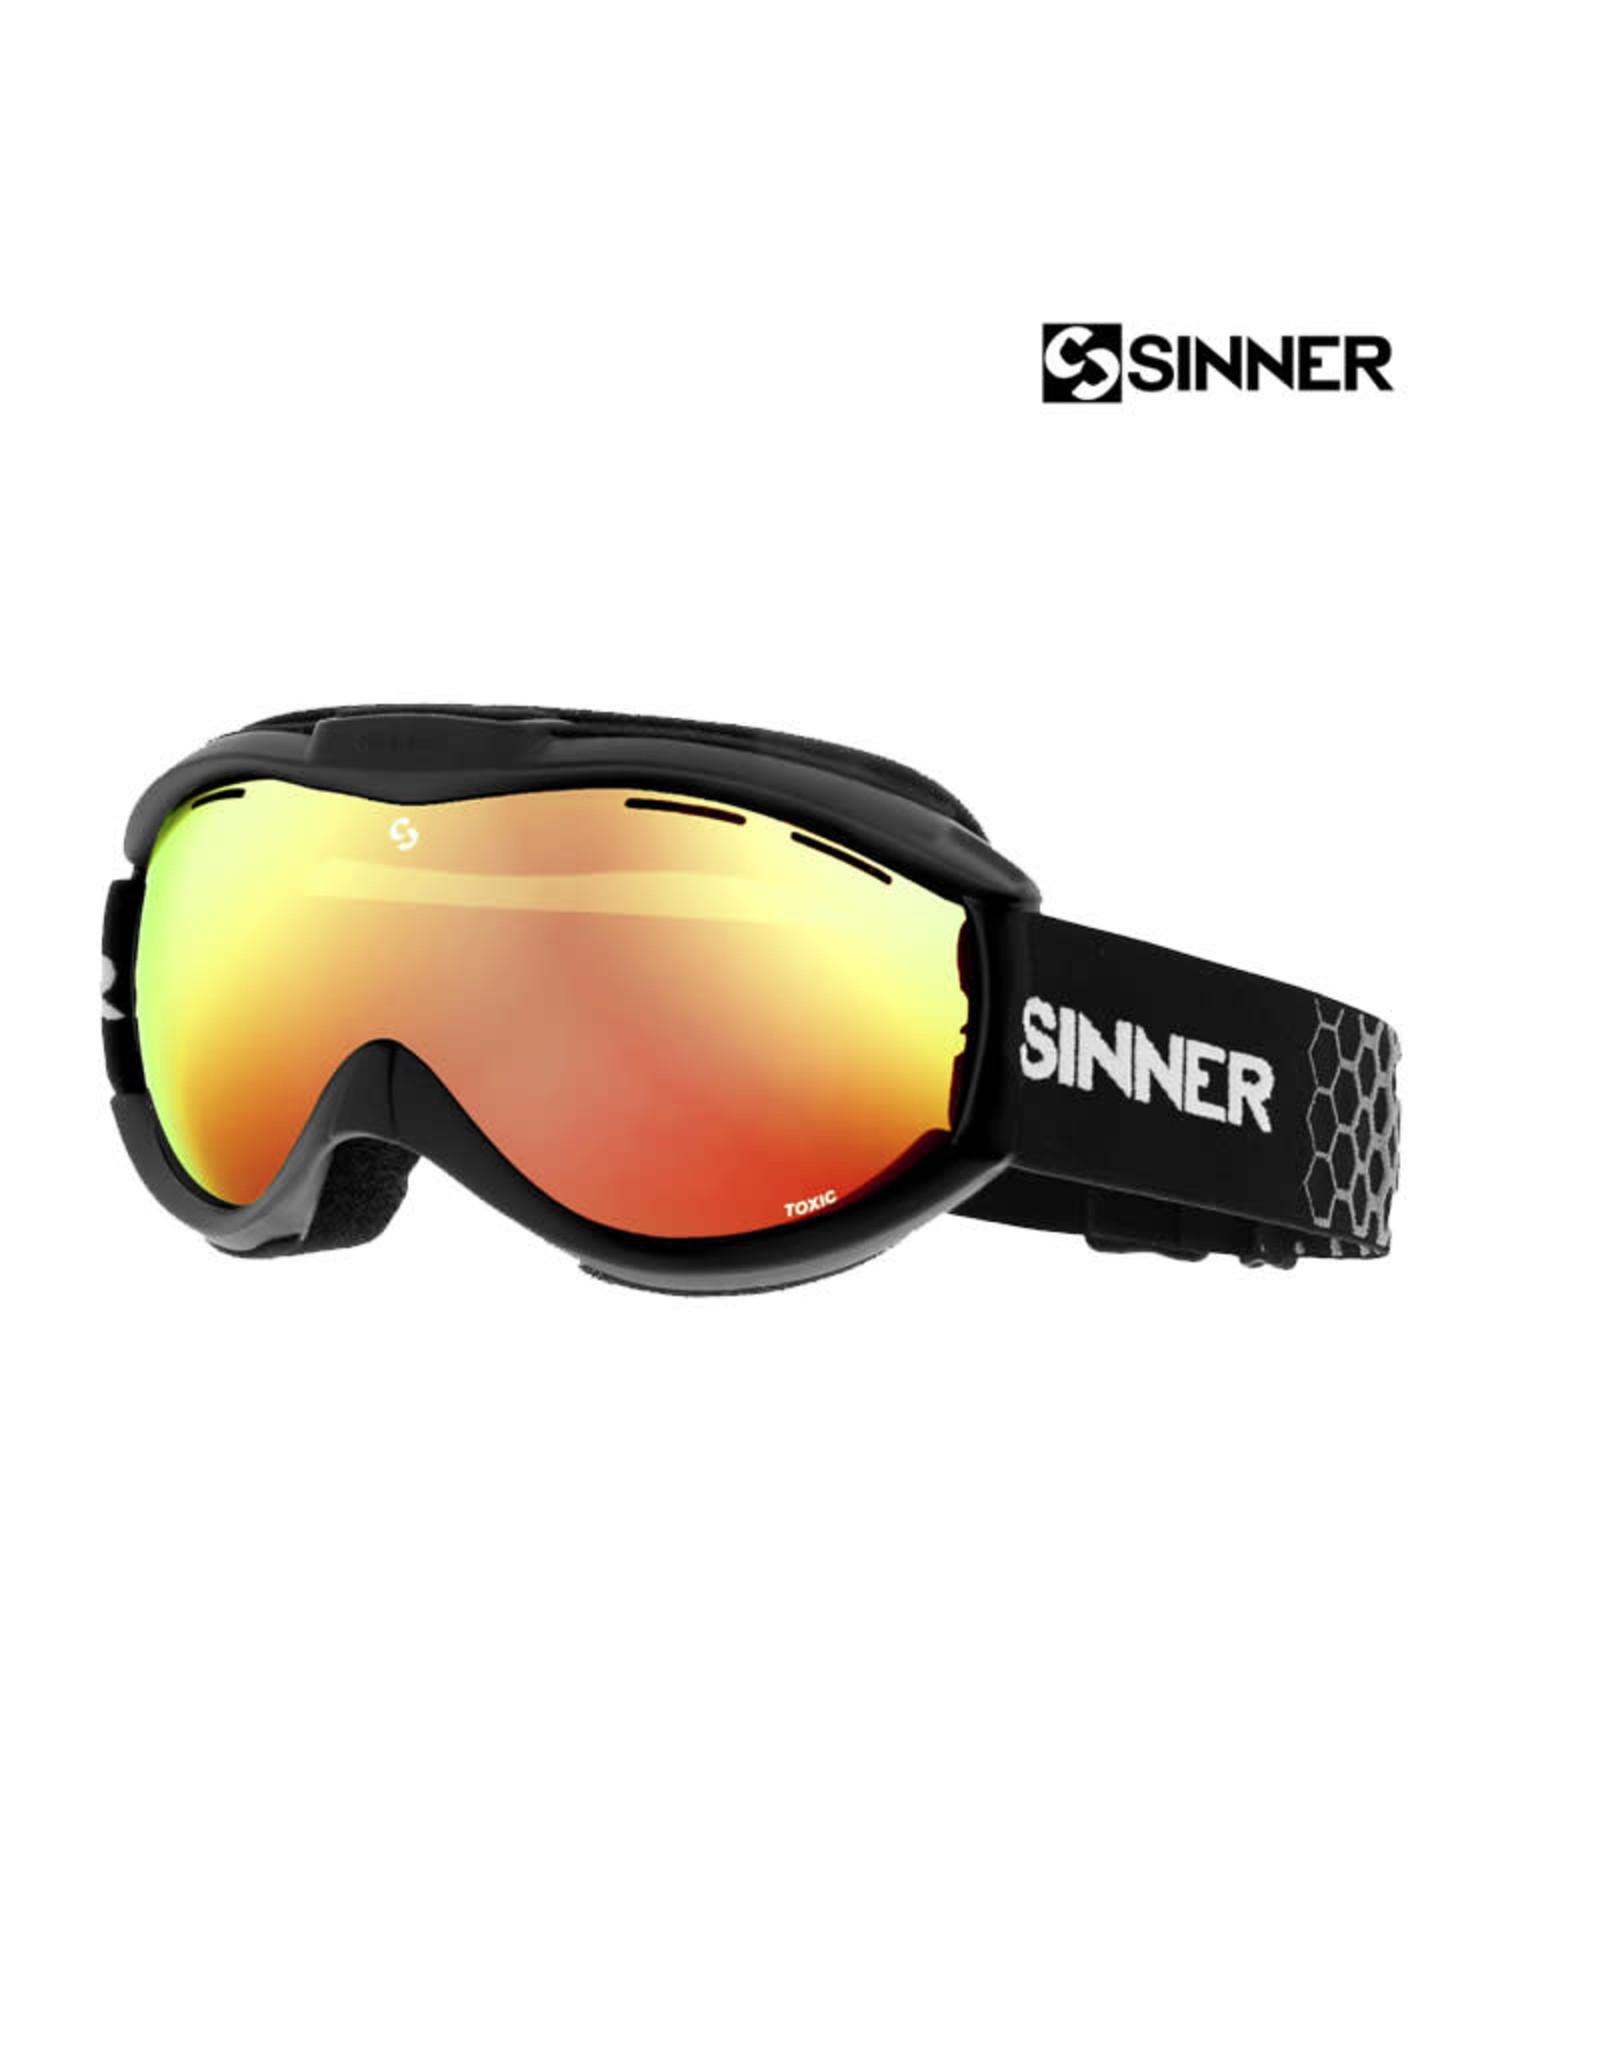 SINNER SKIBRIL SINNER Toxic Mat Black-DBL Orange